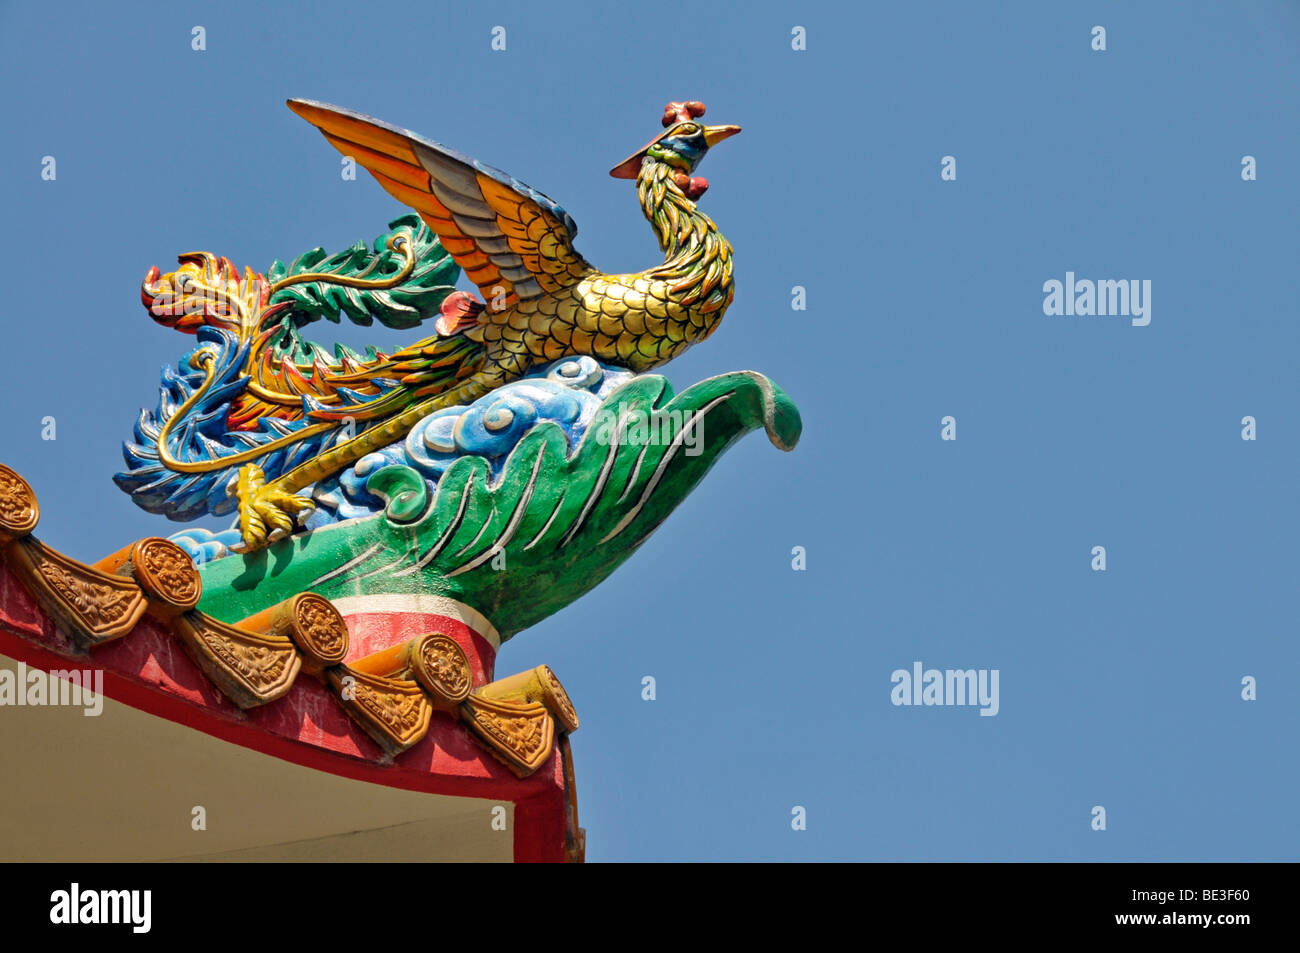 Confucianism Symbol Stock Photos Confucianism Symbol Stock Images